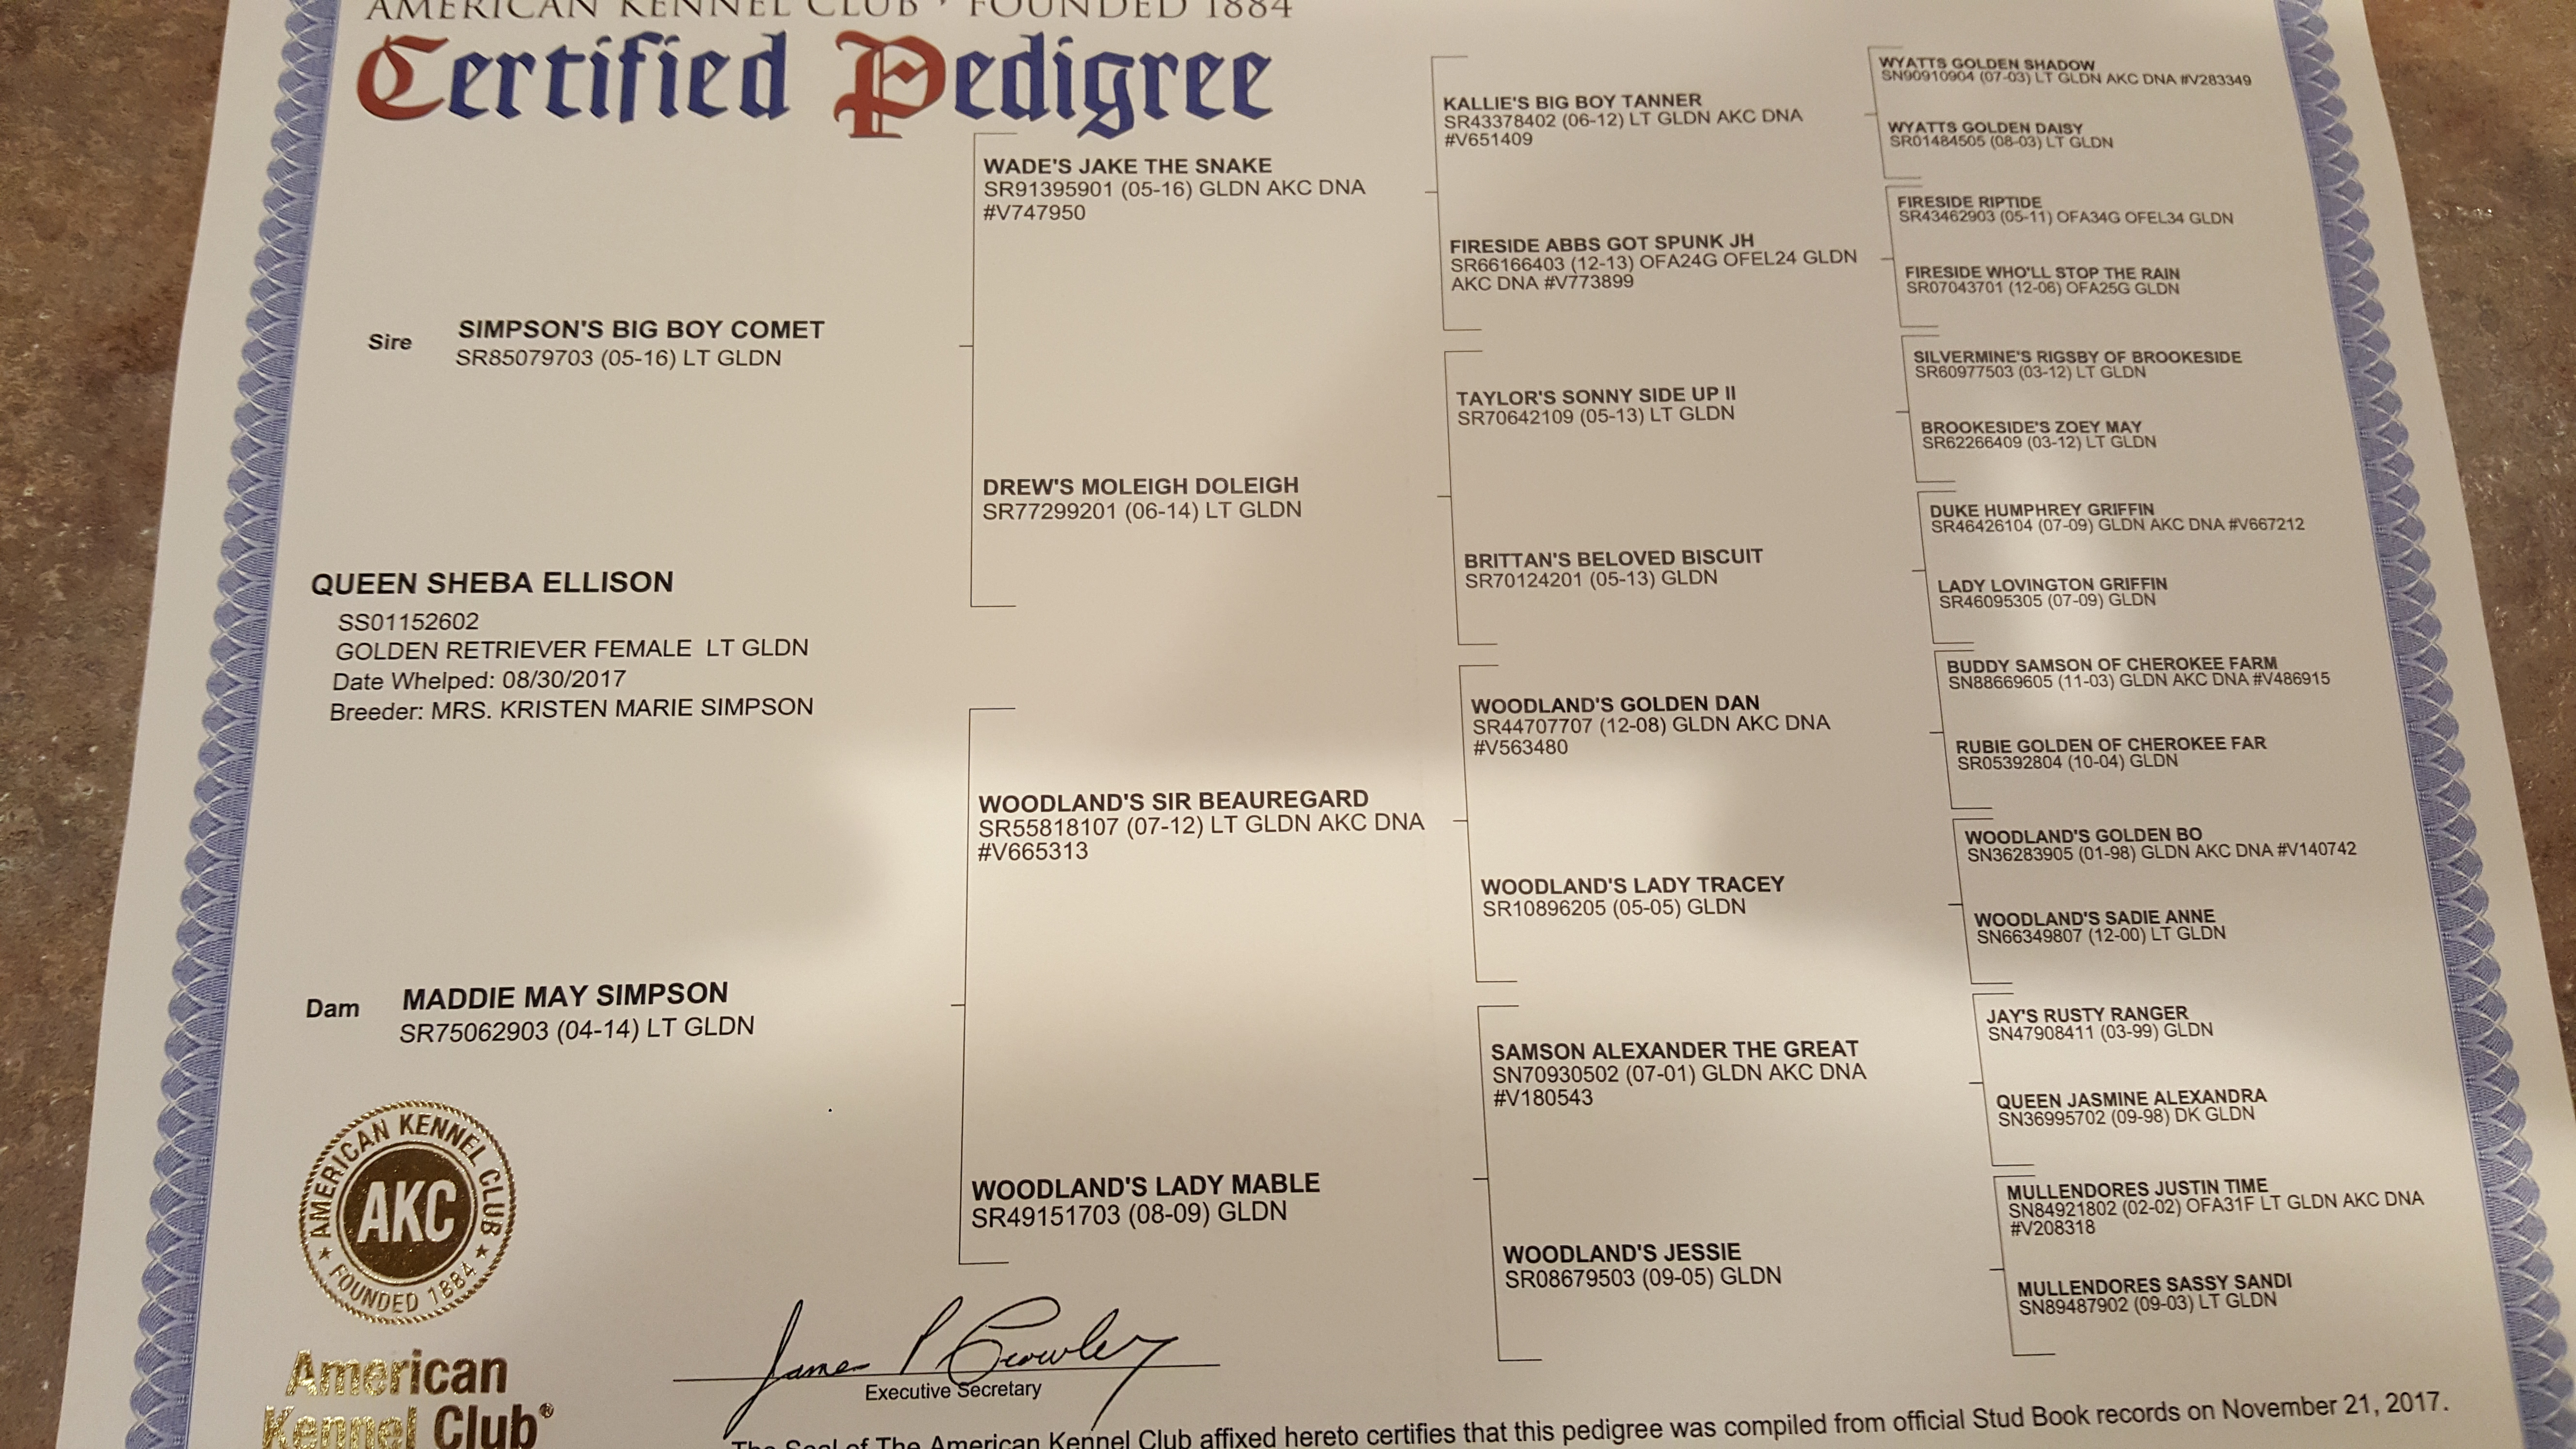 Our Certificates | D&J Golden Retriever puppies